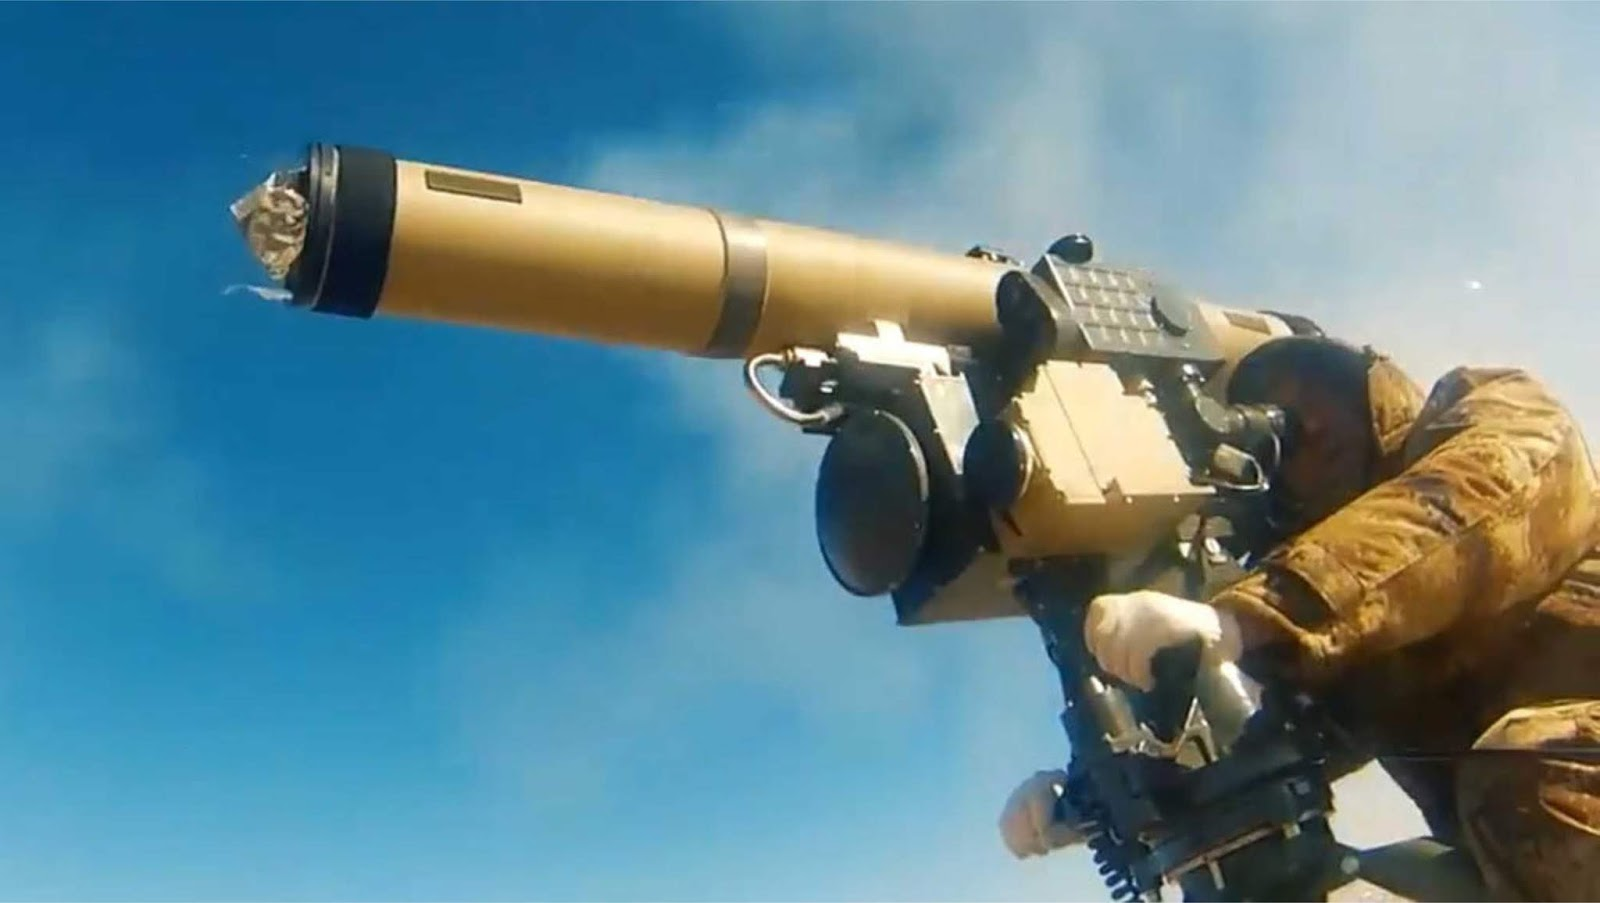 Kompleks anti-tank baru China mirip dengan Kornet milik Rusia